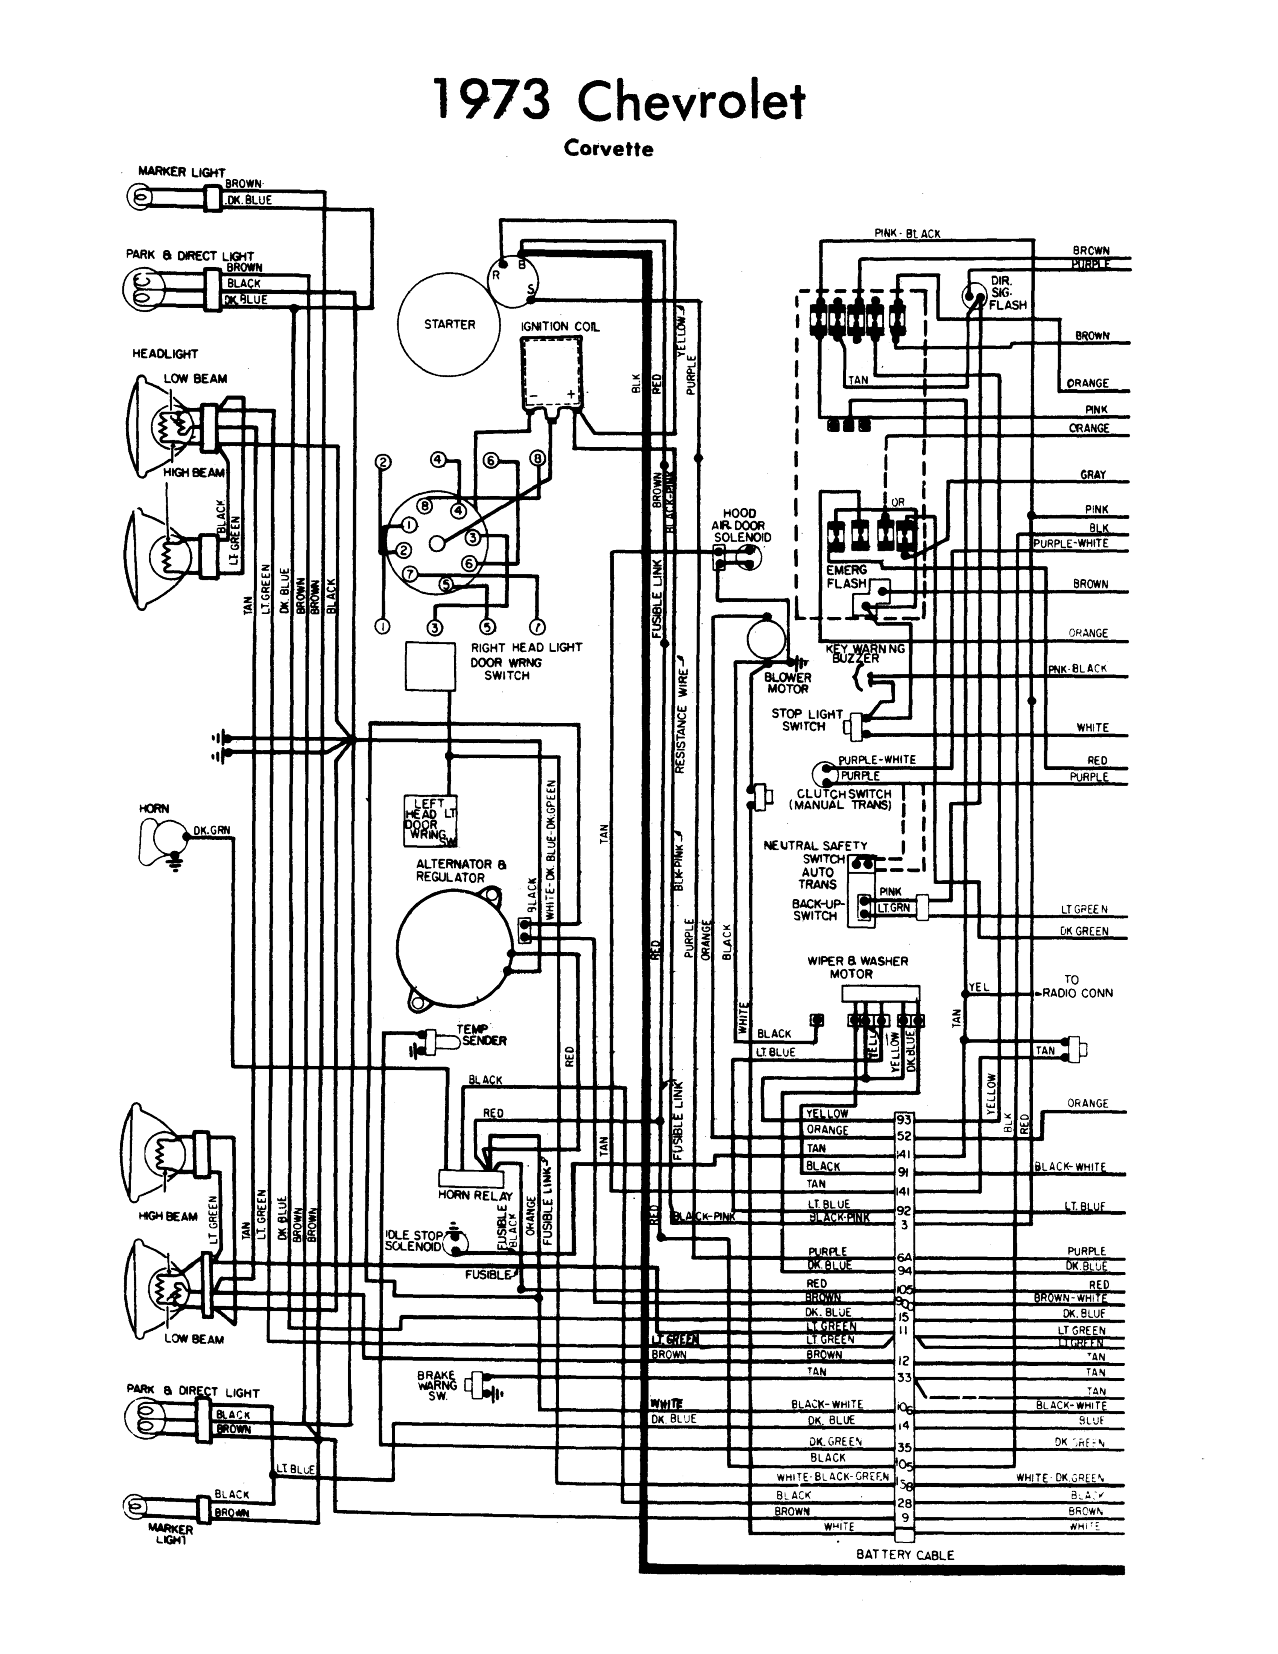 Magnificent Wiring Diagram 1973 Corvette Chevy Corvette 1973 Wiring Diagrams Wiring Cloud Uslyletkolfr09Org